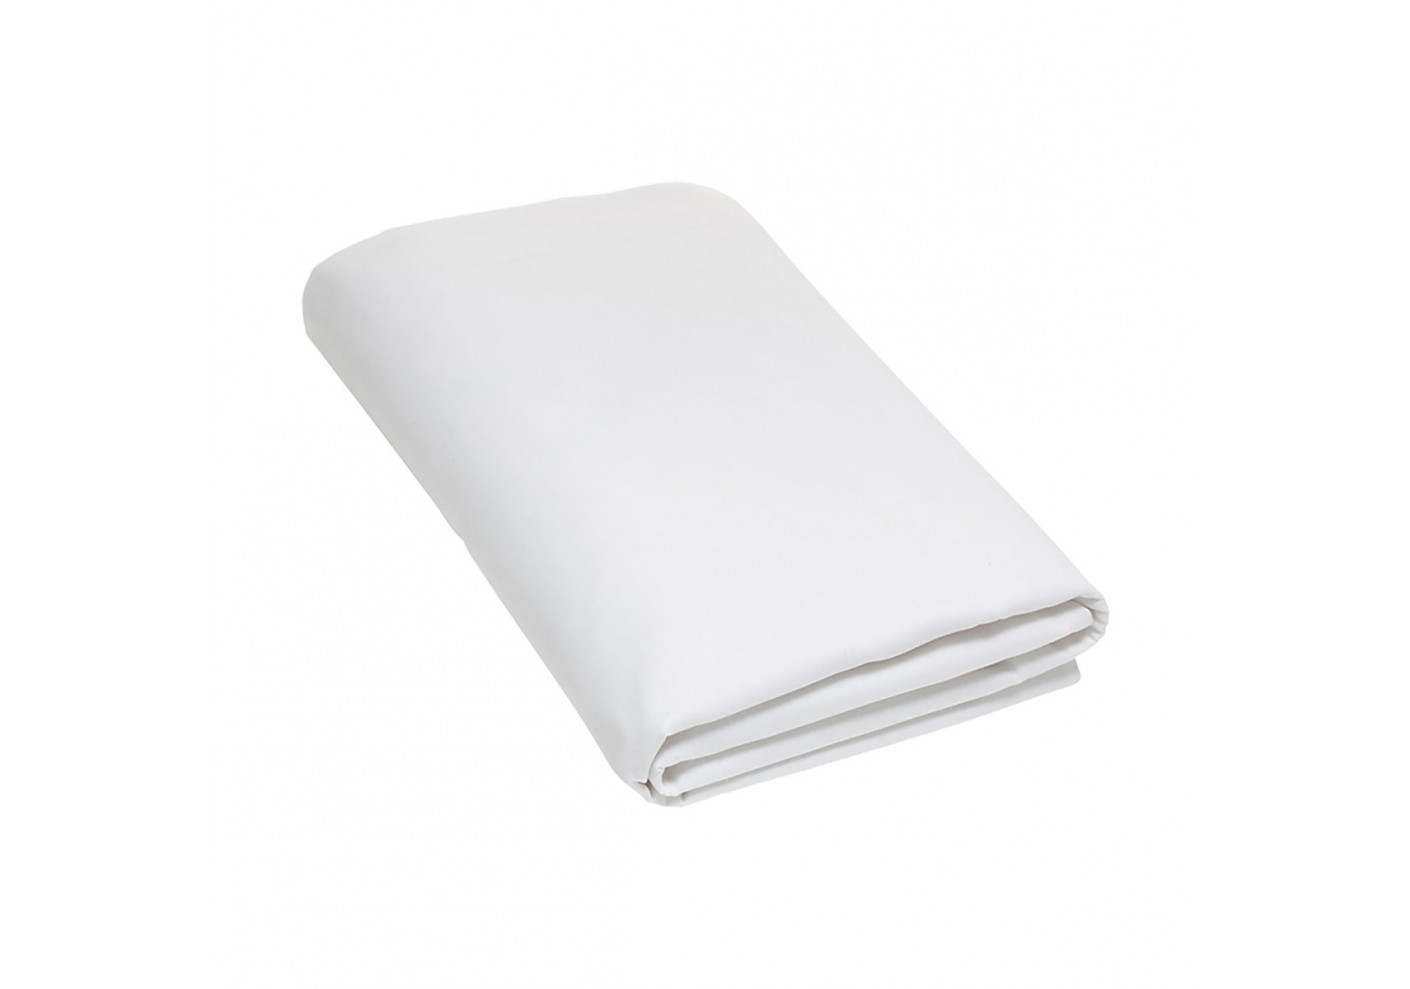 drap plat 240x300 blanc literie. Black Bedroom Furniture Sets. Home Design Ideas